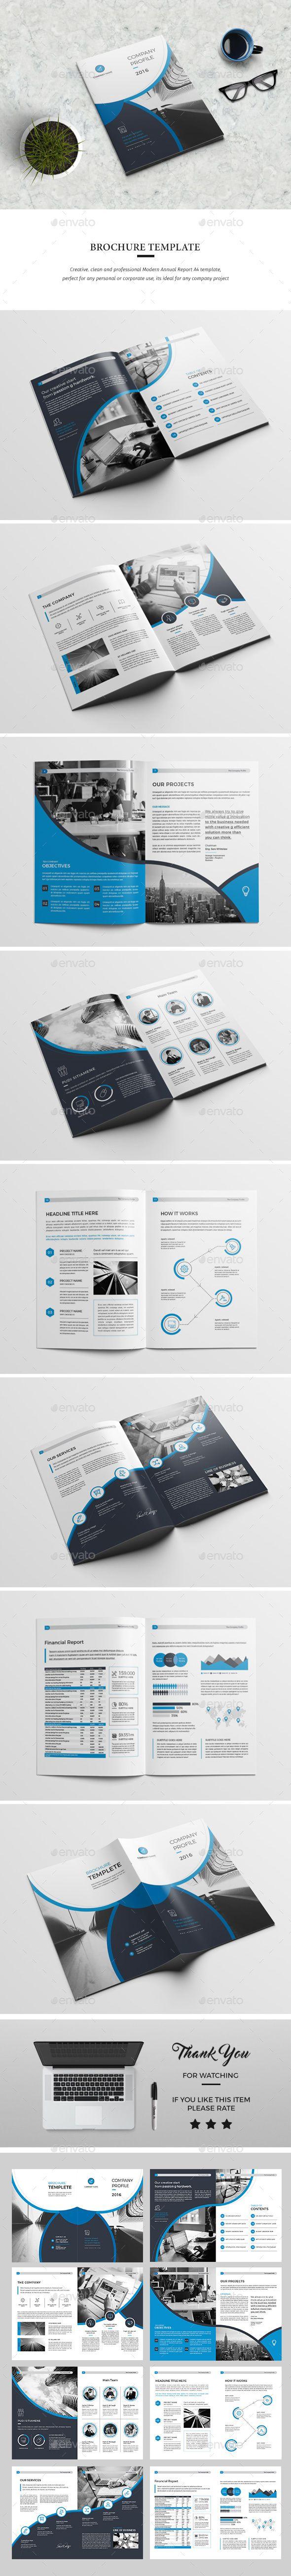 Business Plan - #Corporate #Brochures Download here: https://graphicriver.net/item/business-plan/19376095?ref=alena994